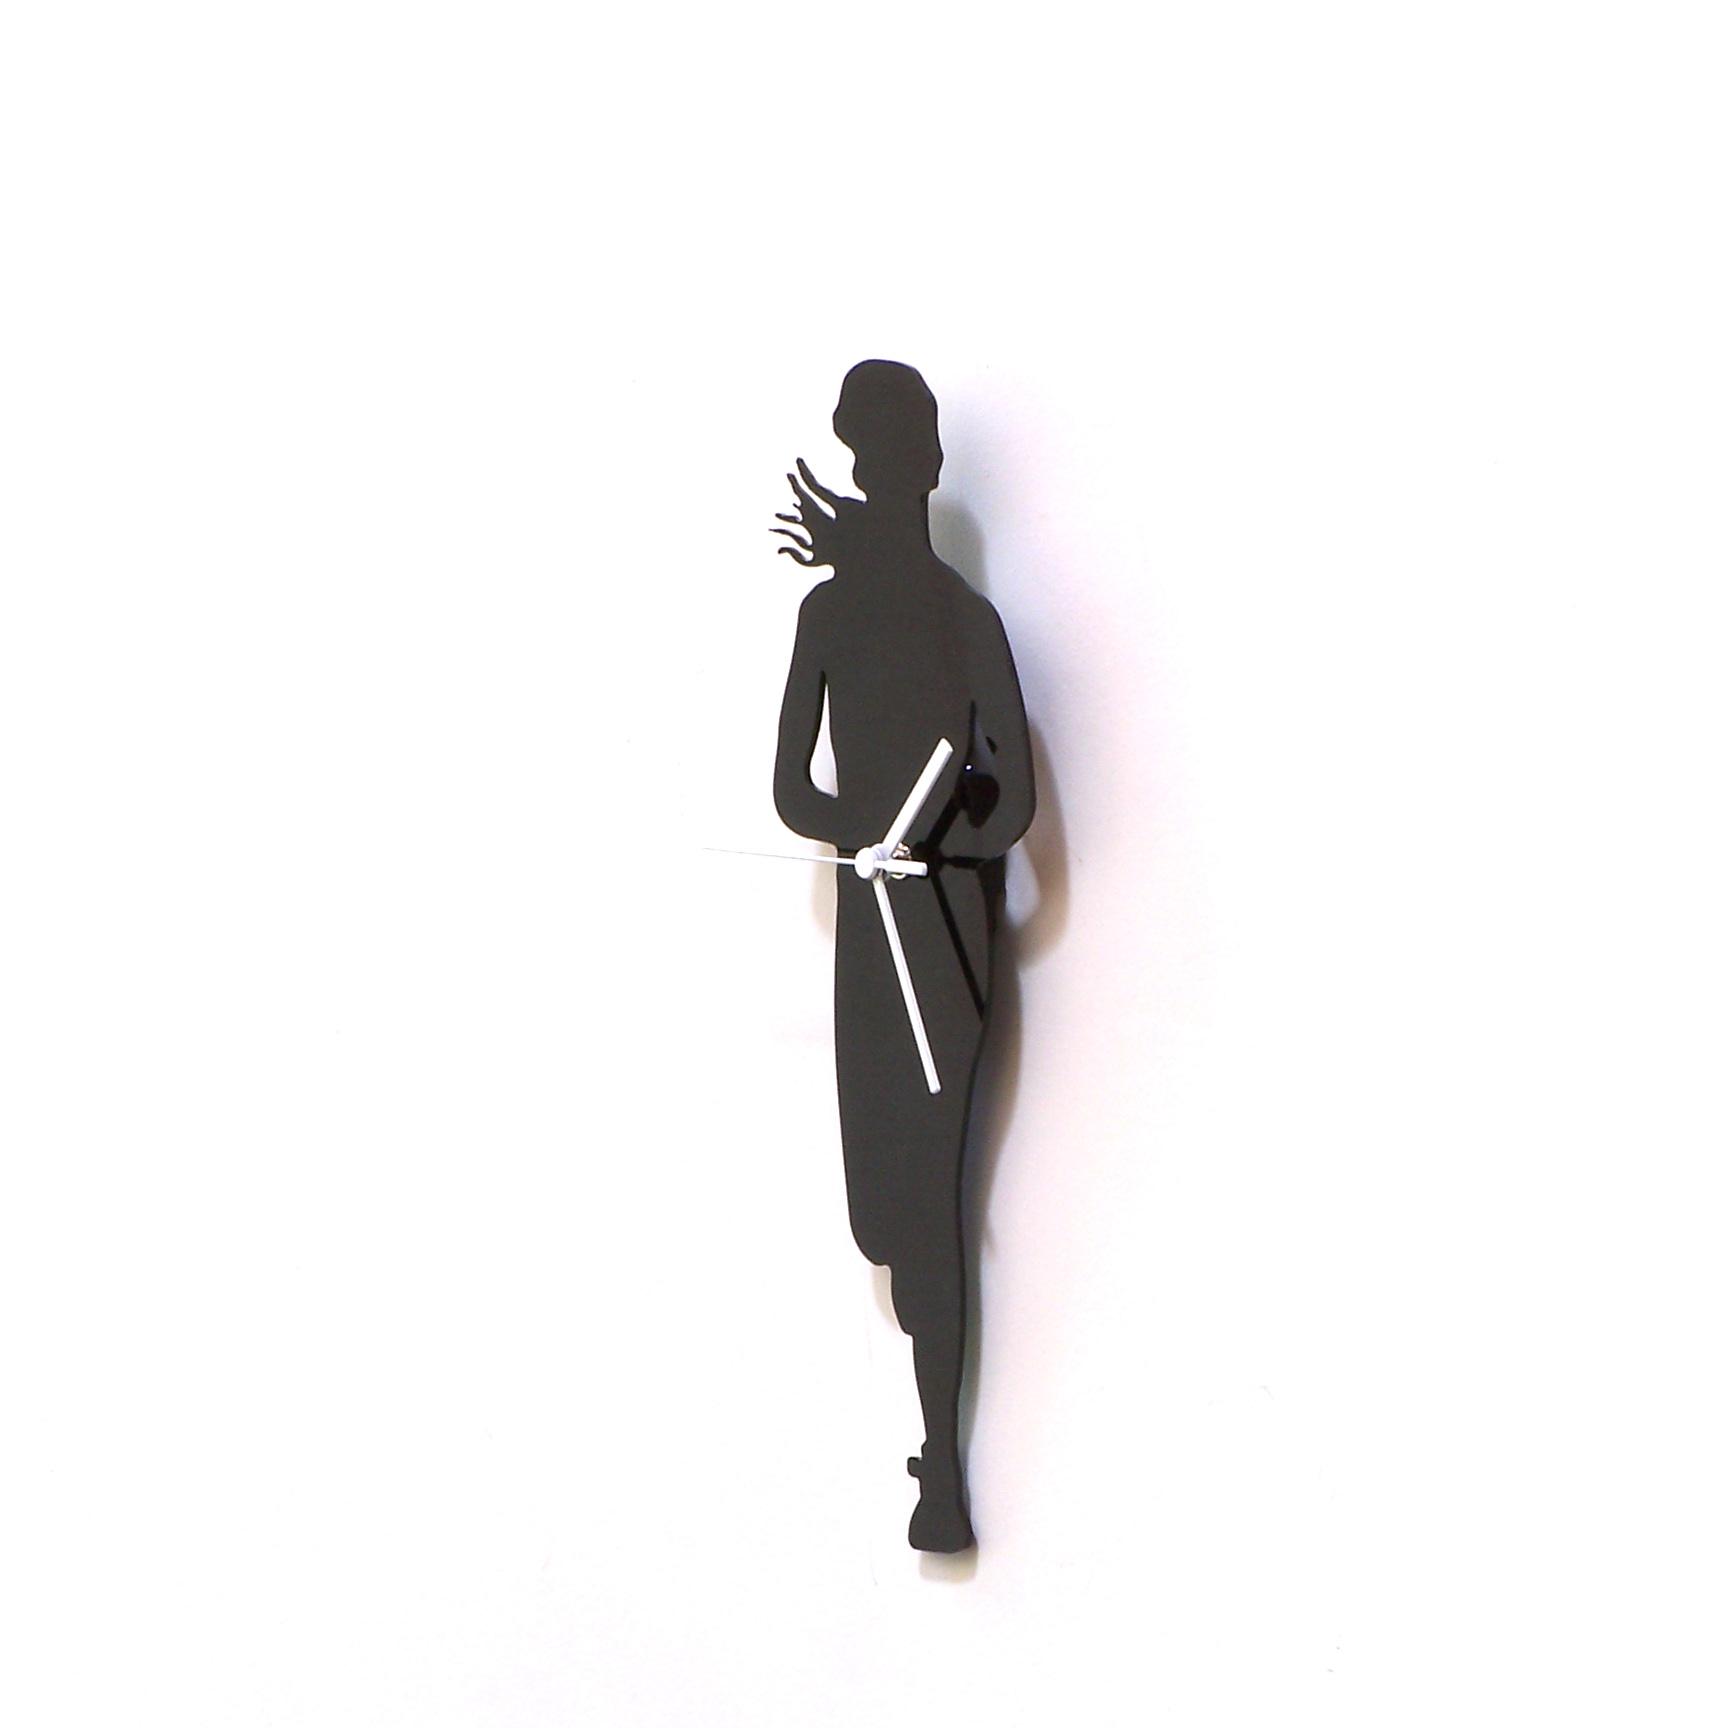 Running Woman Black Acrylic Wall Clock A Piece Of Wall Art Sport Clock Gift For Runner Silhouette Clock 183 Ardeola 183 Online Store Powered